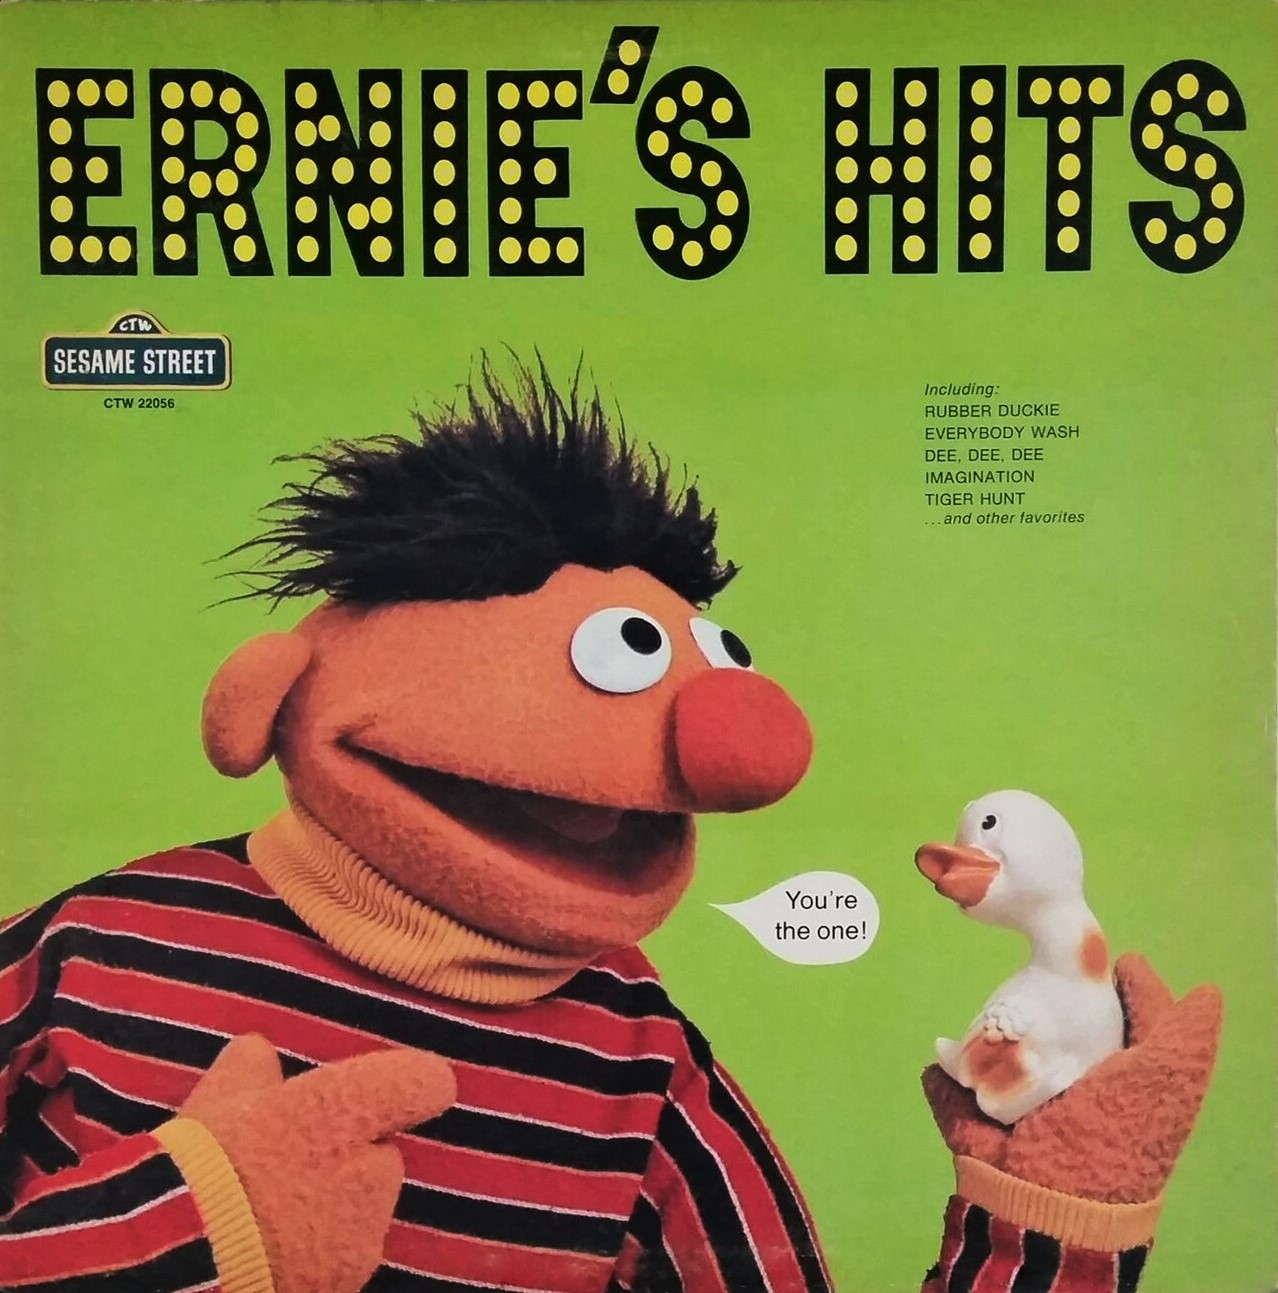 File:ErnieHits.jpg